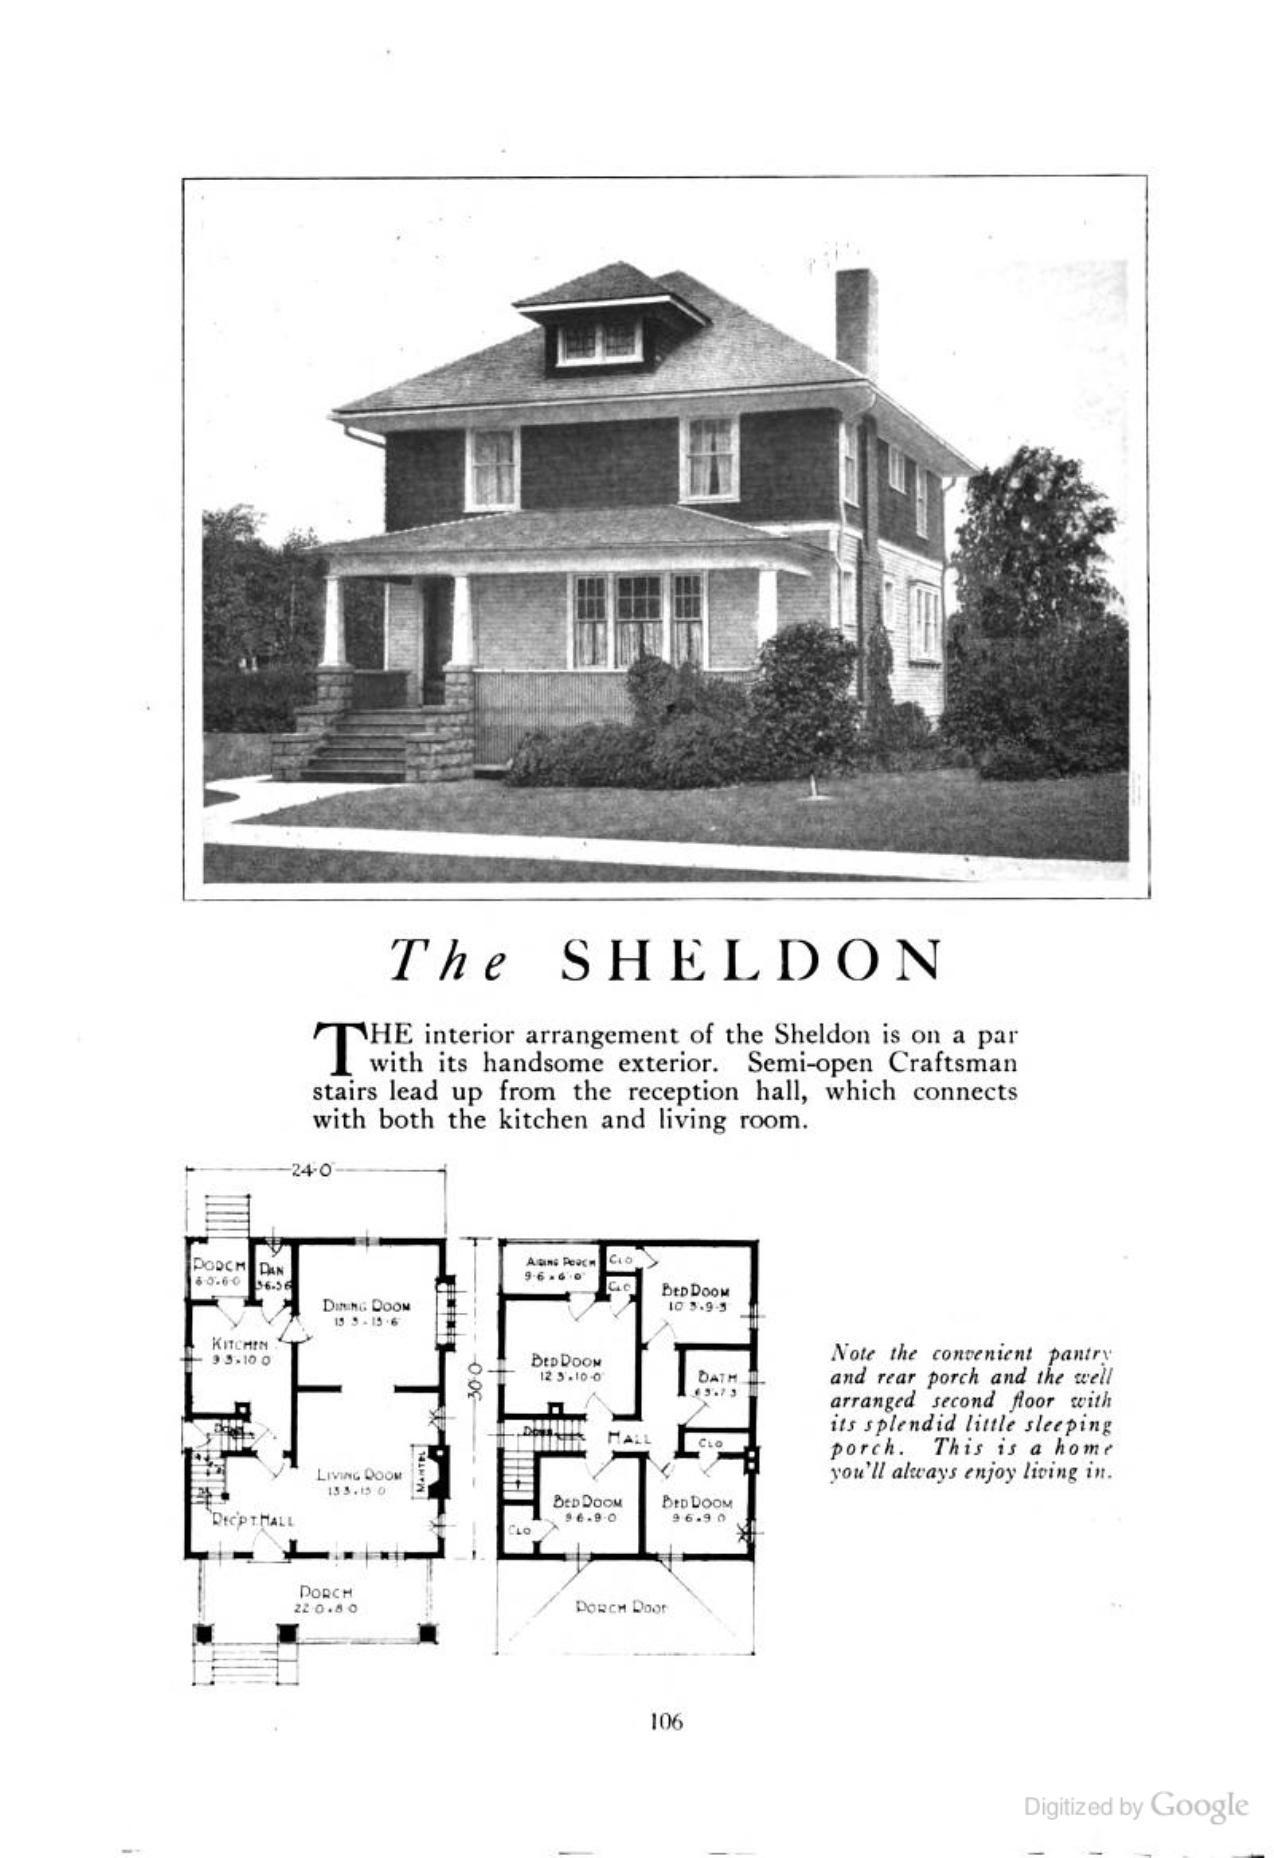 The Sheldon (an American Foursquare kit house/house plan